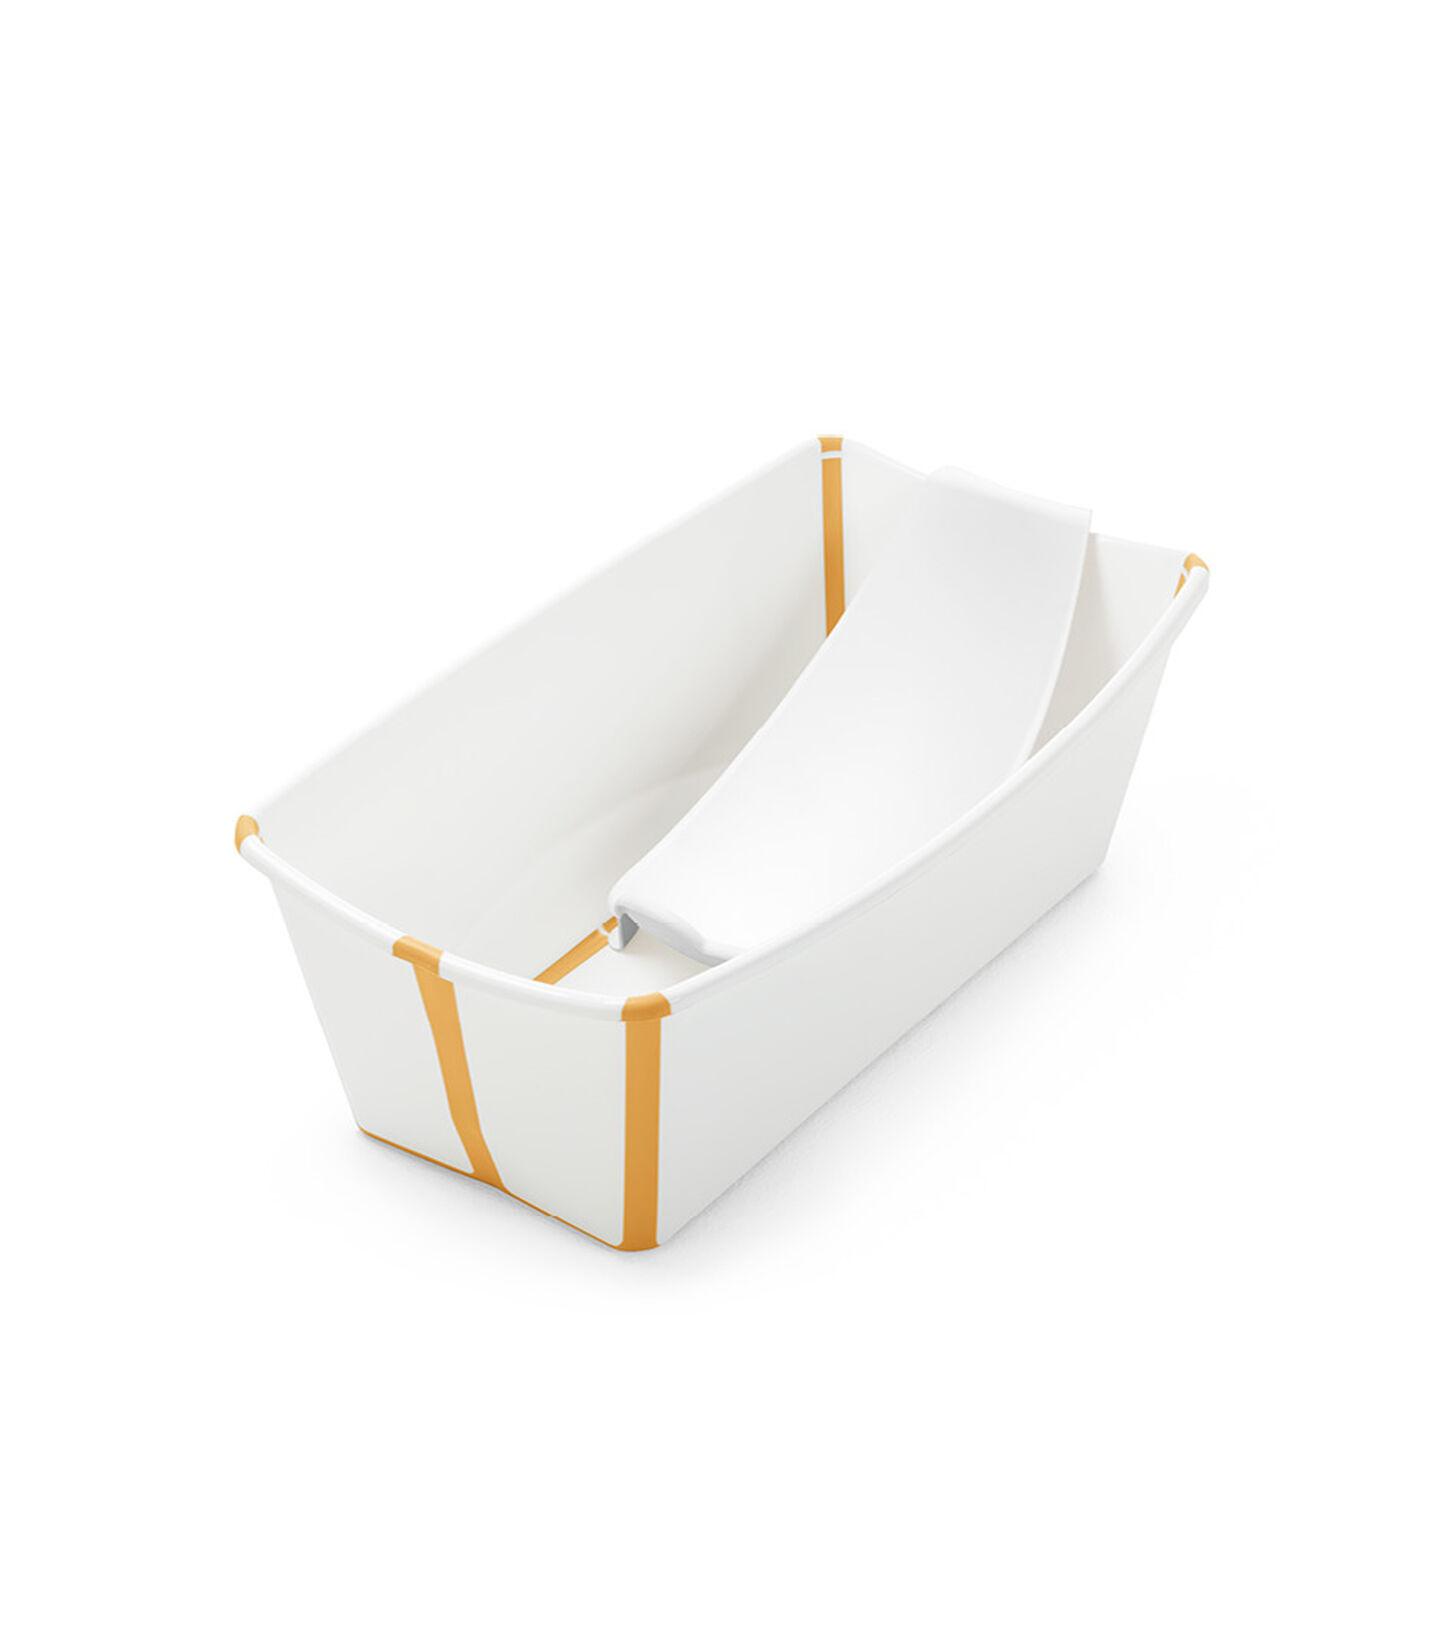 Stokke® Flexi Bath® bath tub, White Yellow with Newborn insert. view 2